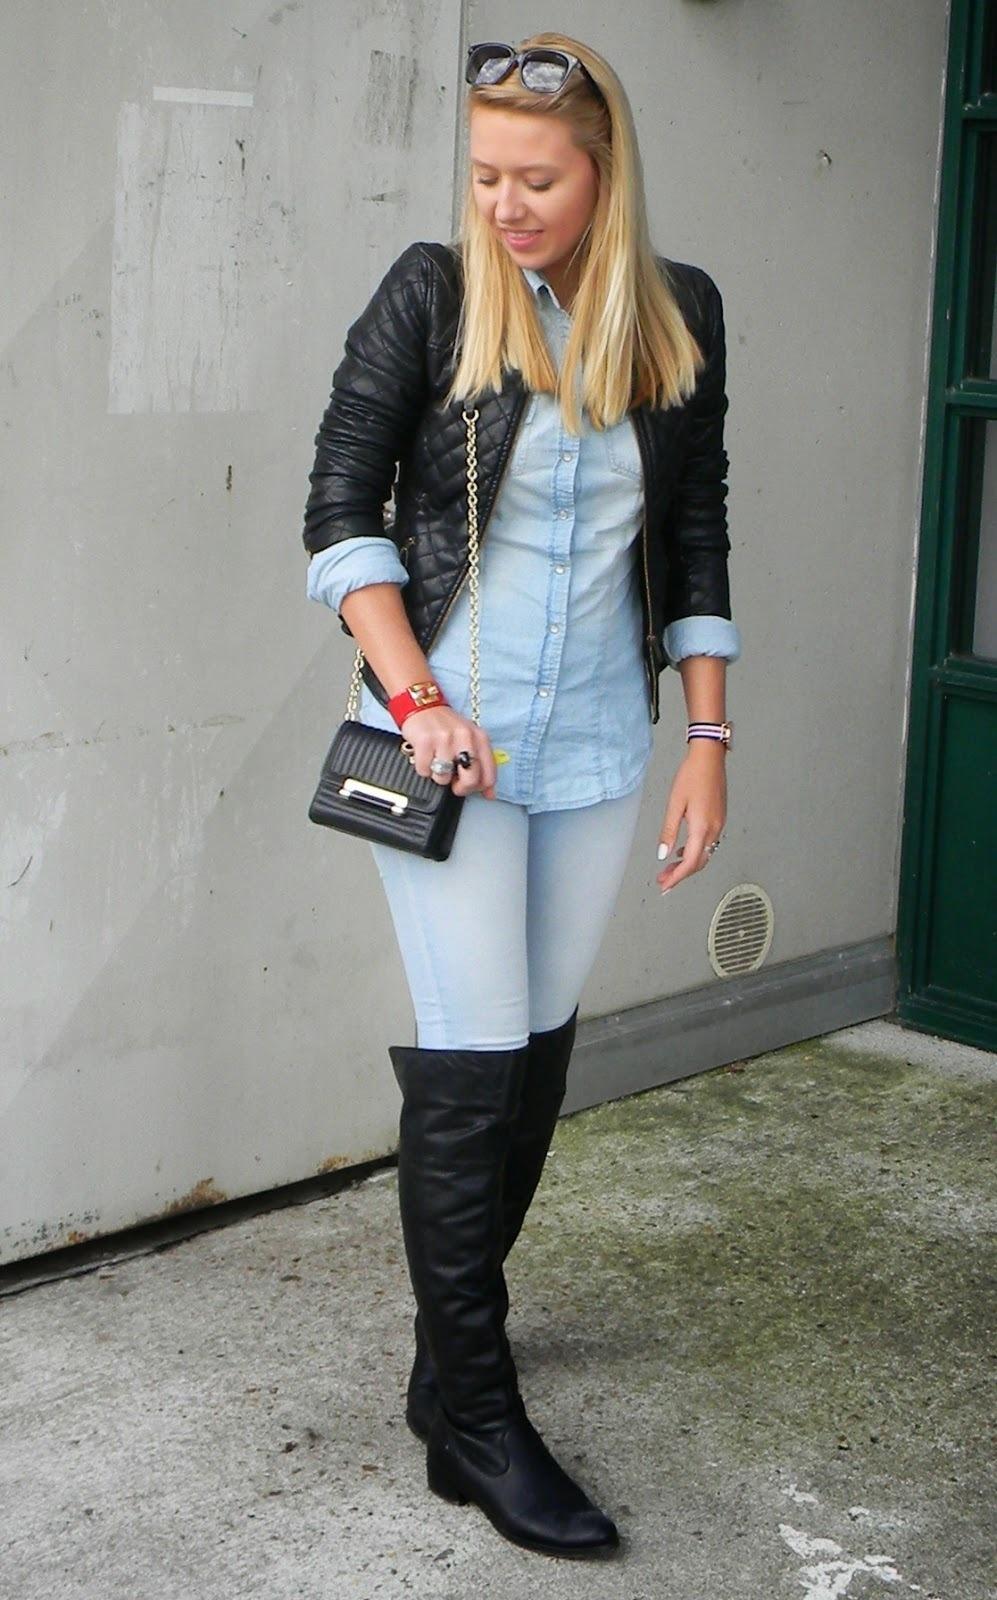 Women&39s Black Leather Jacket Light Blue Denim Shirt Light Blue